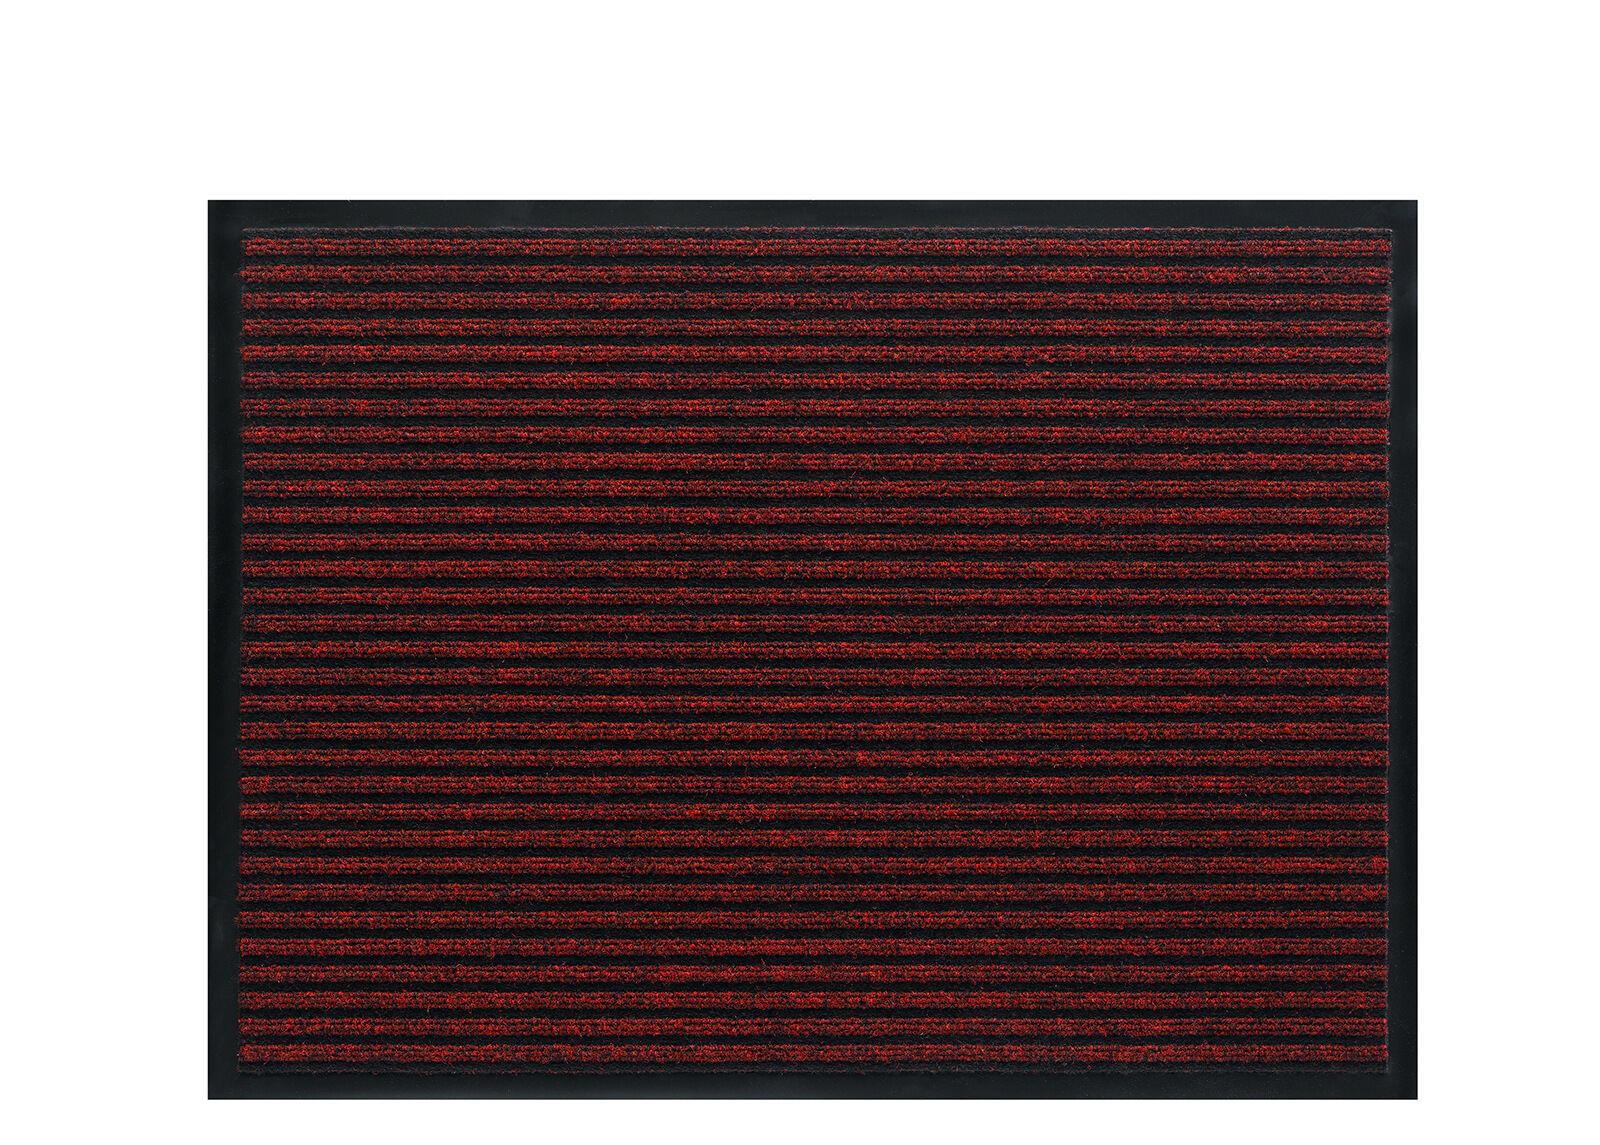 Hamat Eteismatto EVERTON 40x60 cm